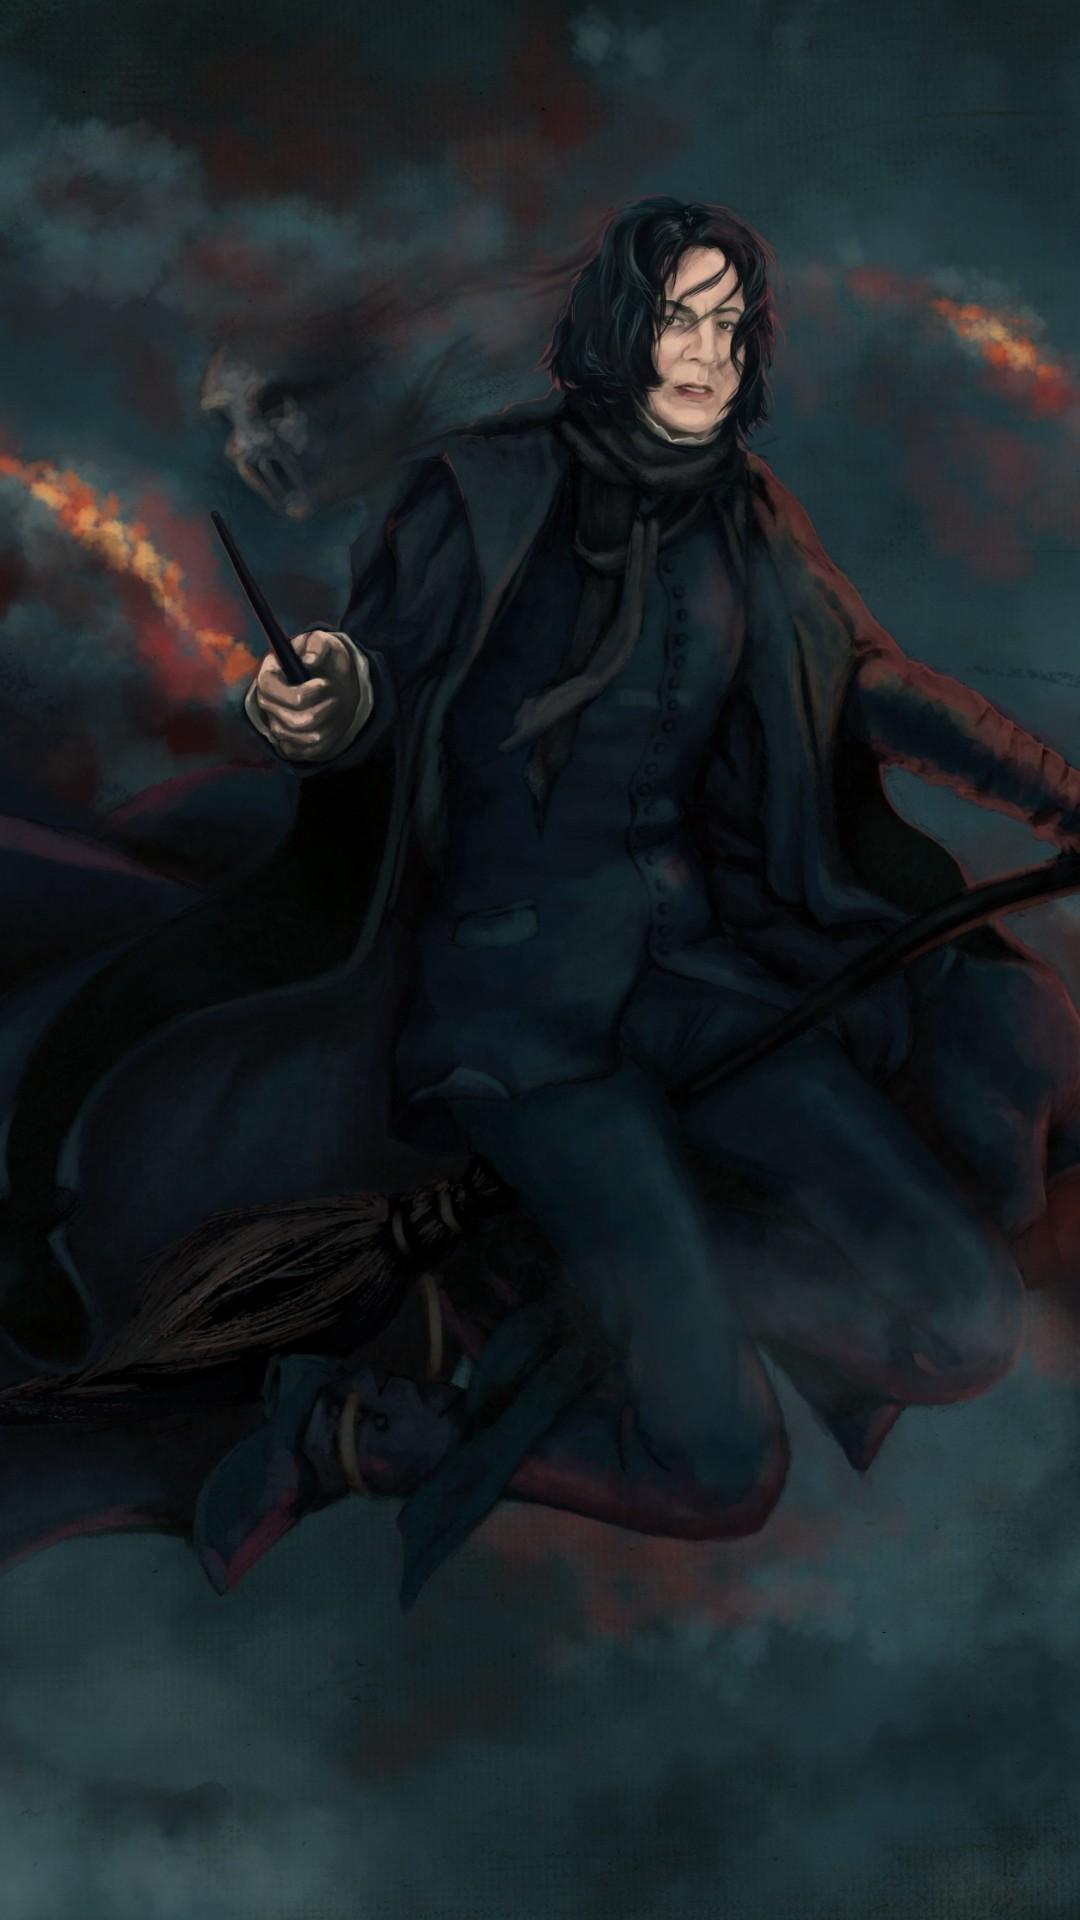 Best Wallpaper Harry Potter Concept Art - 658468  Graphic_80713.jpg